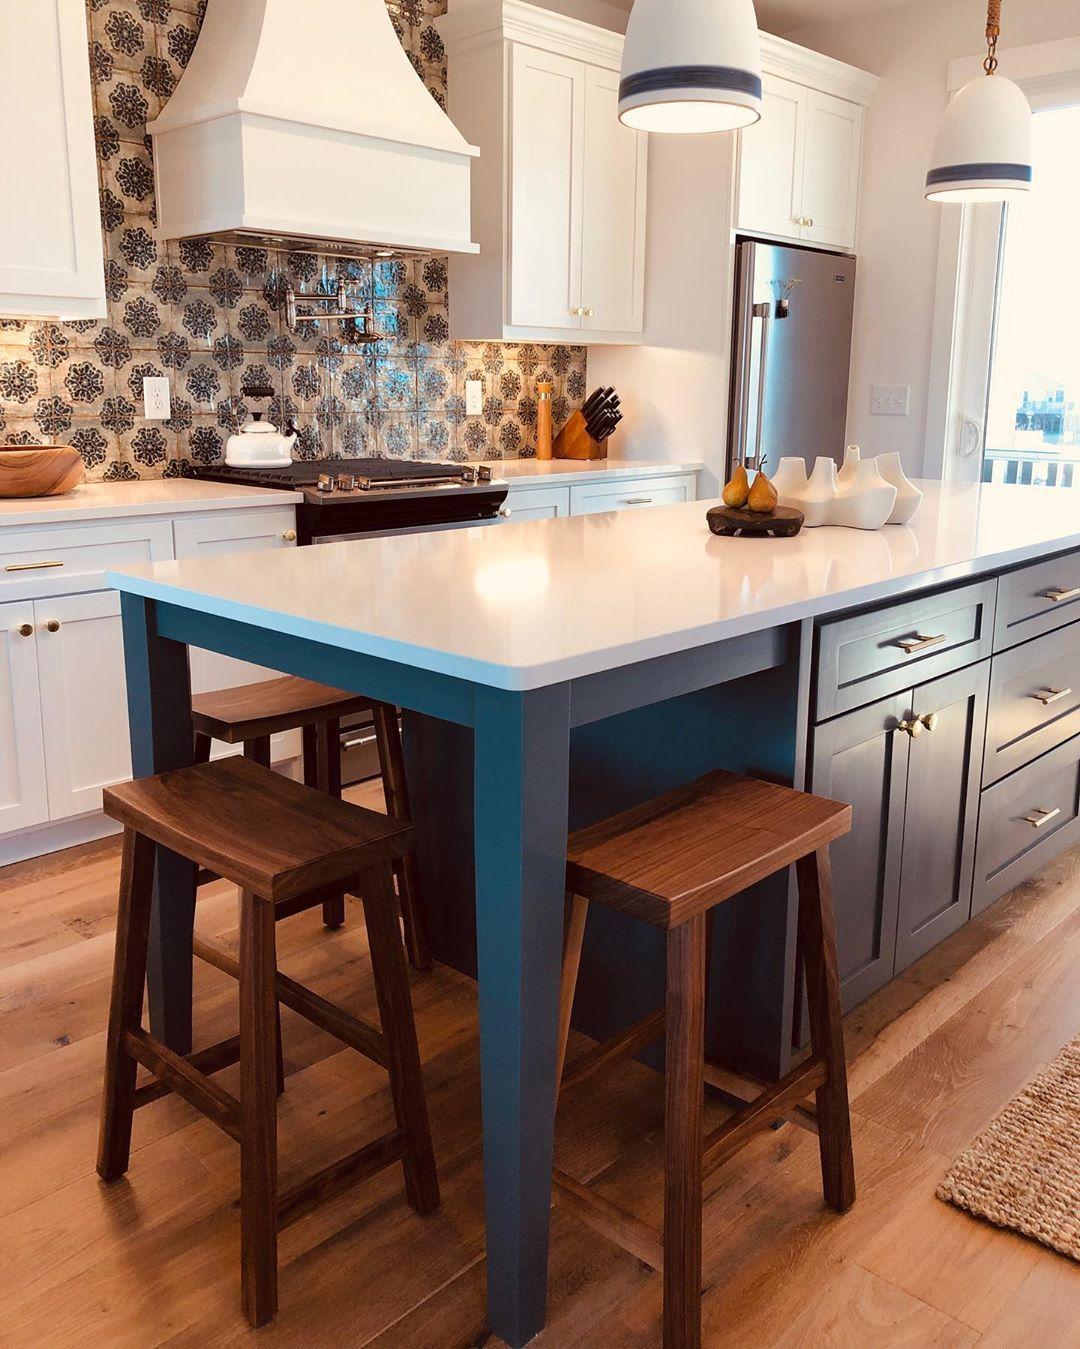 angela harris dunmore vechio decor 8x8 ceramic tile in 2020 kitchen interior kitchen remodel on kitchen interior tiles id=96634